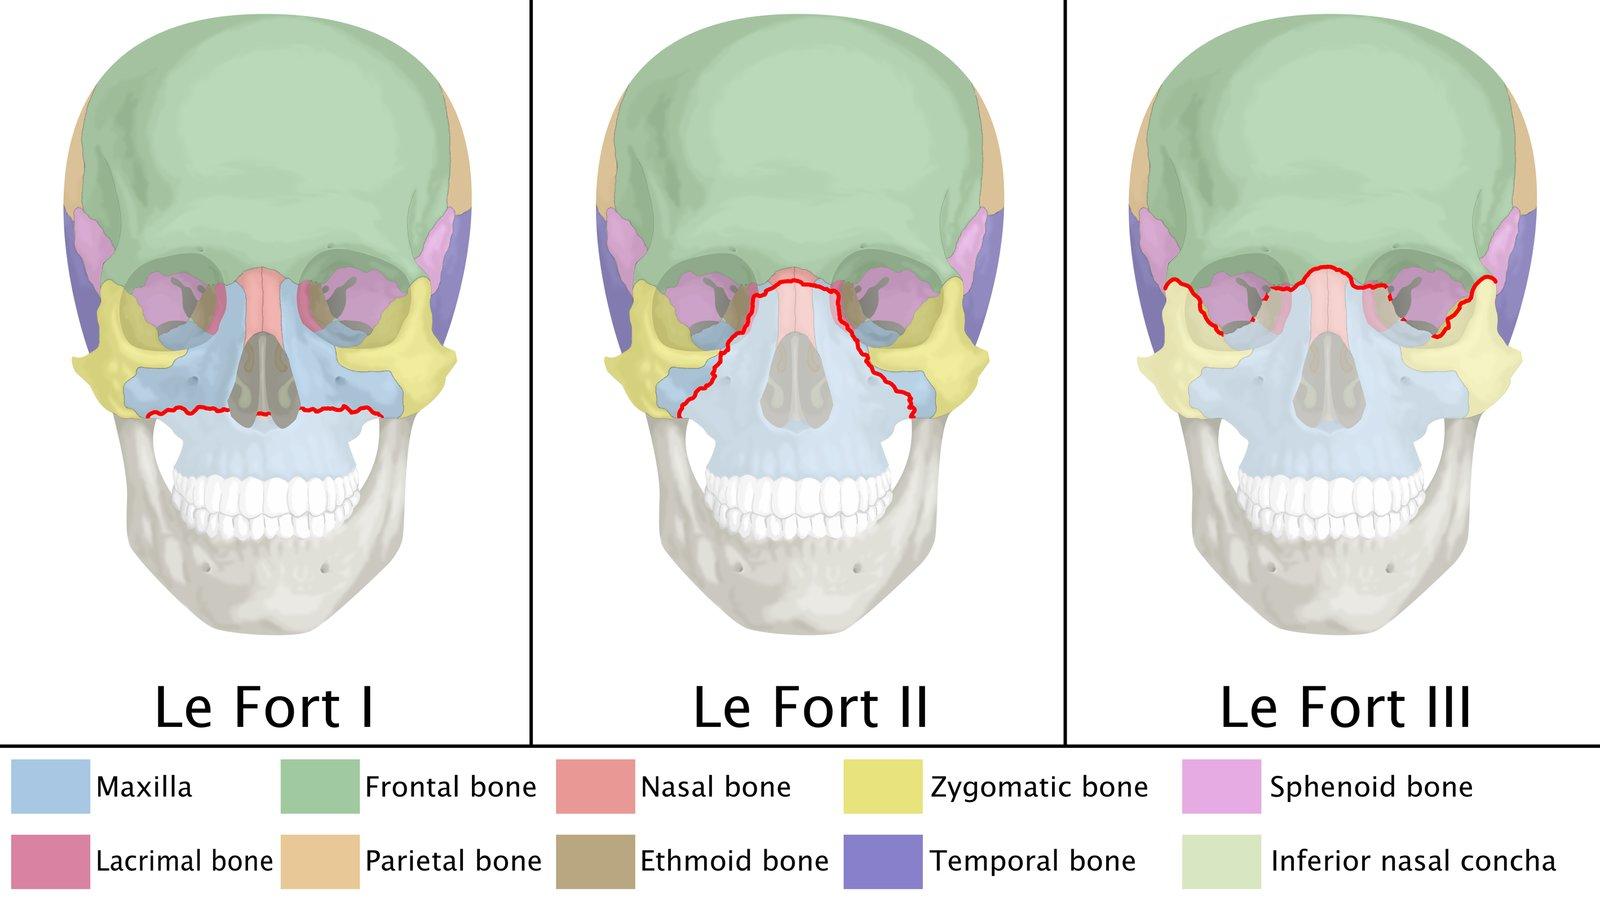 Skull fracture of basilar signs Battle's sign: